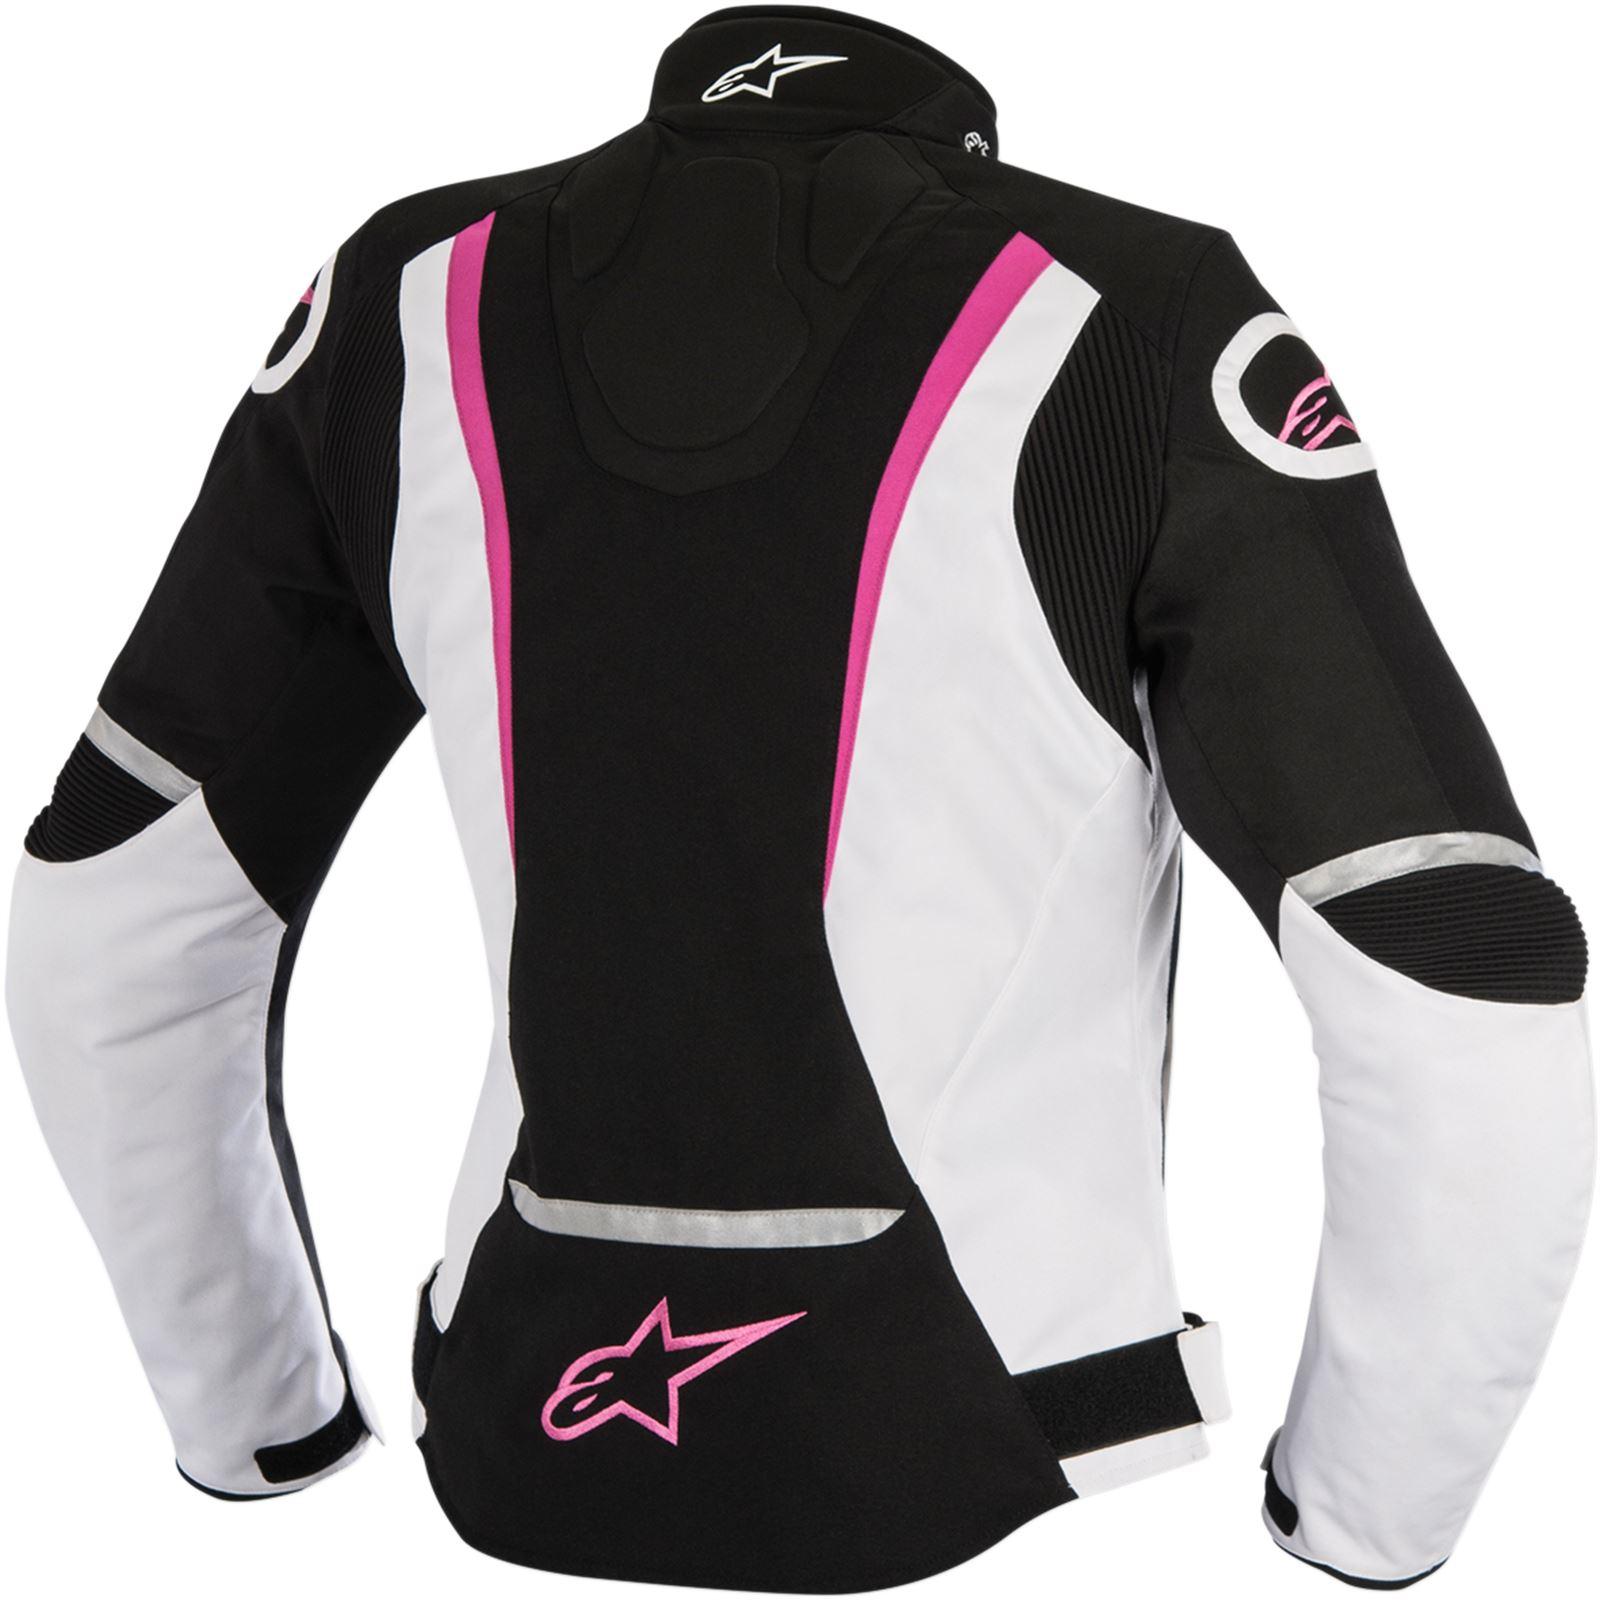 Alpinestars Stella Jaws Leather Jacket - Black/White/Pink - Small